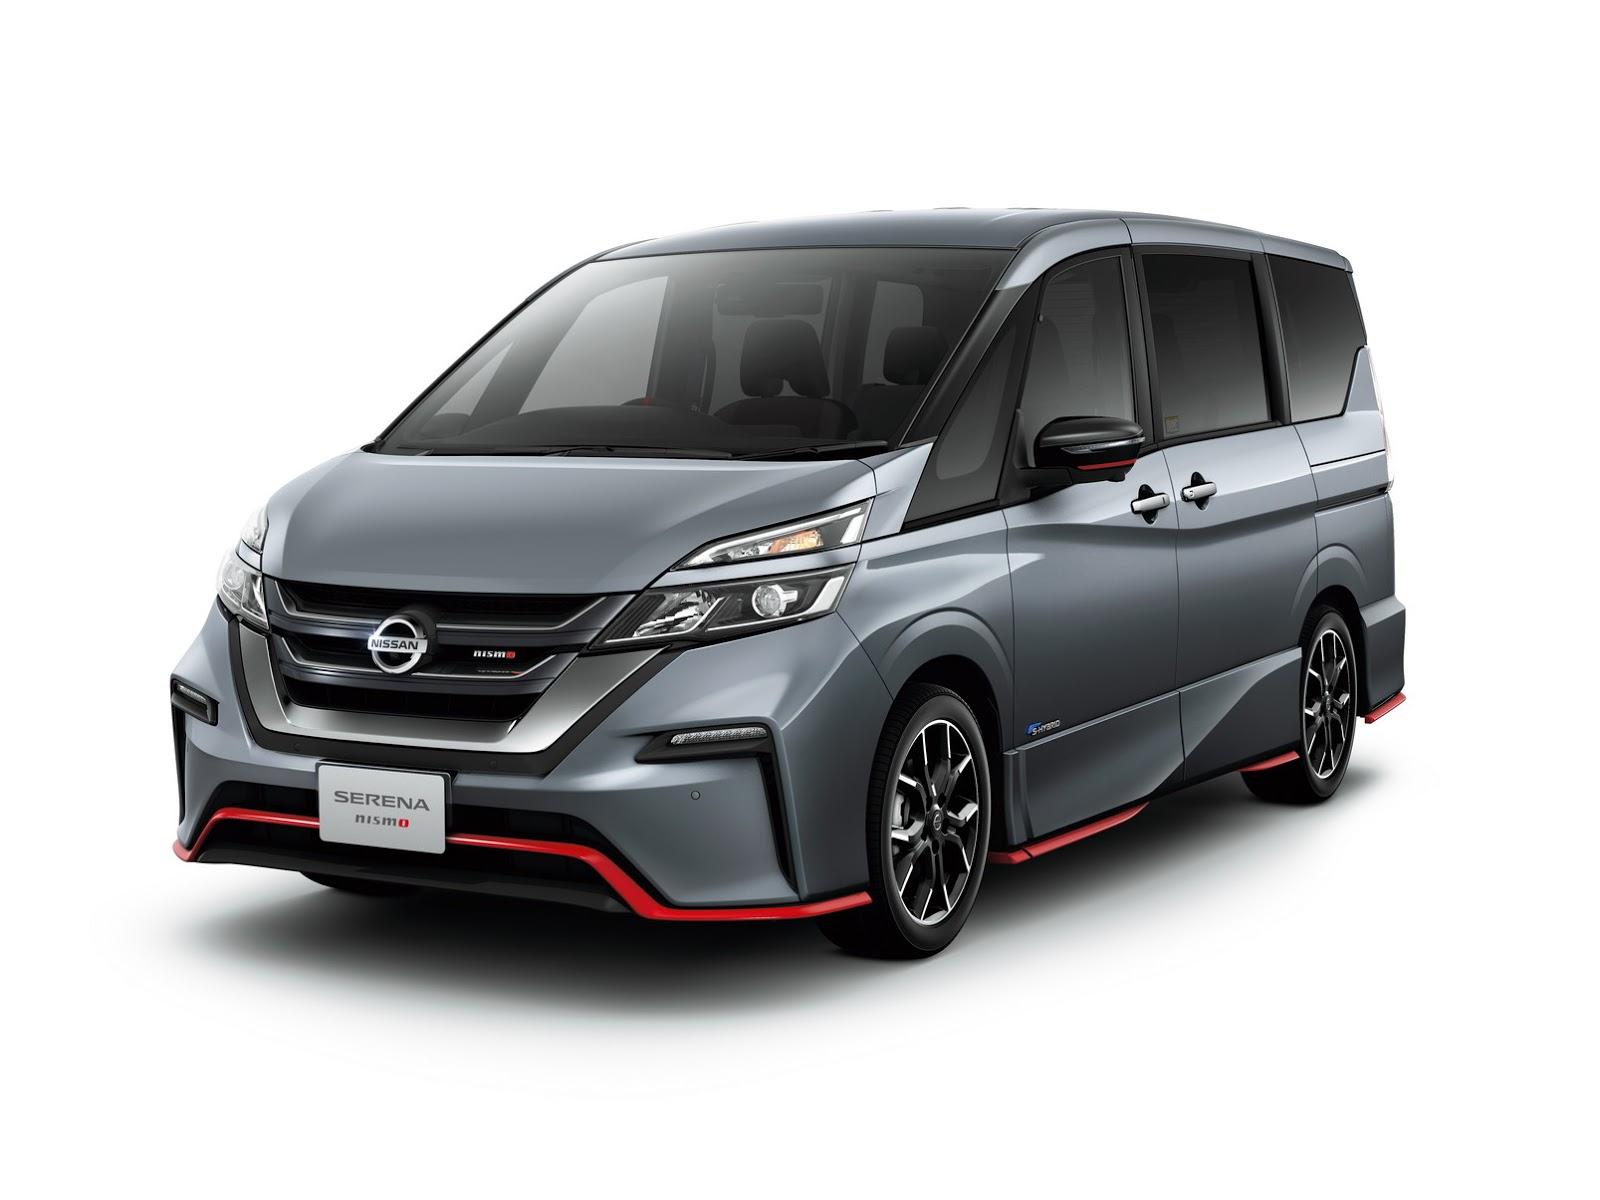 Nissan_Serena_Nismo_21